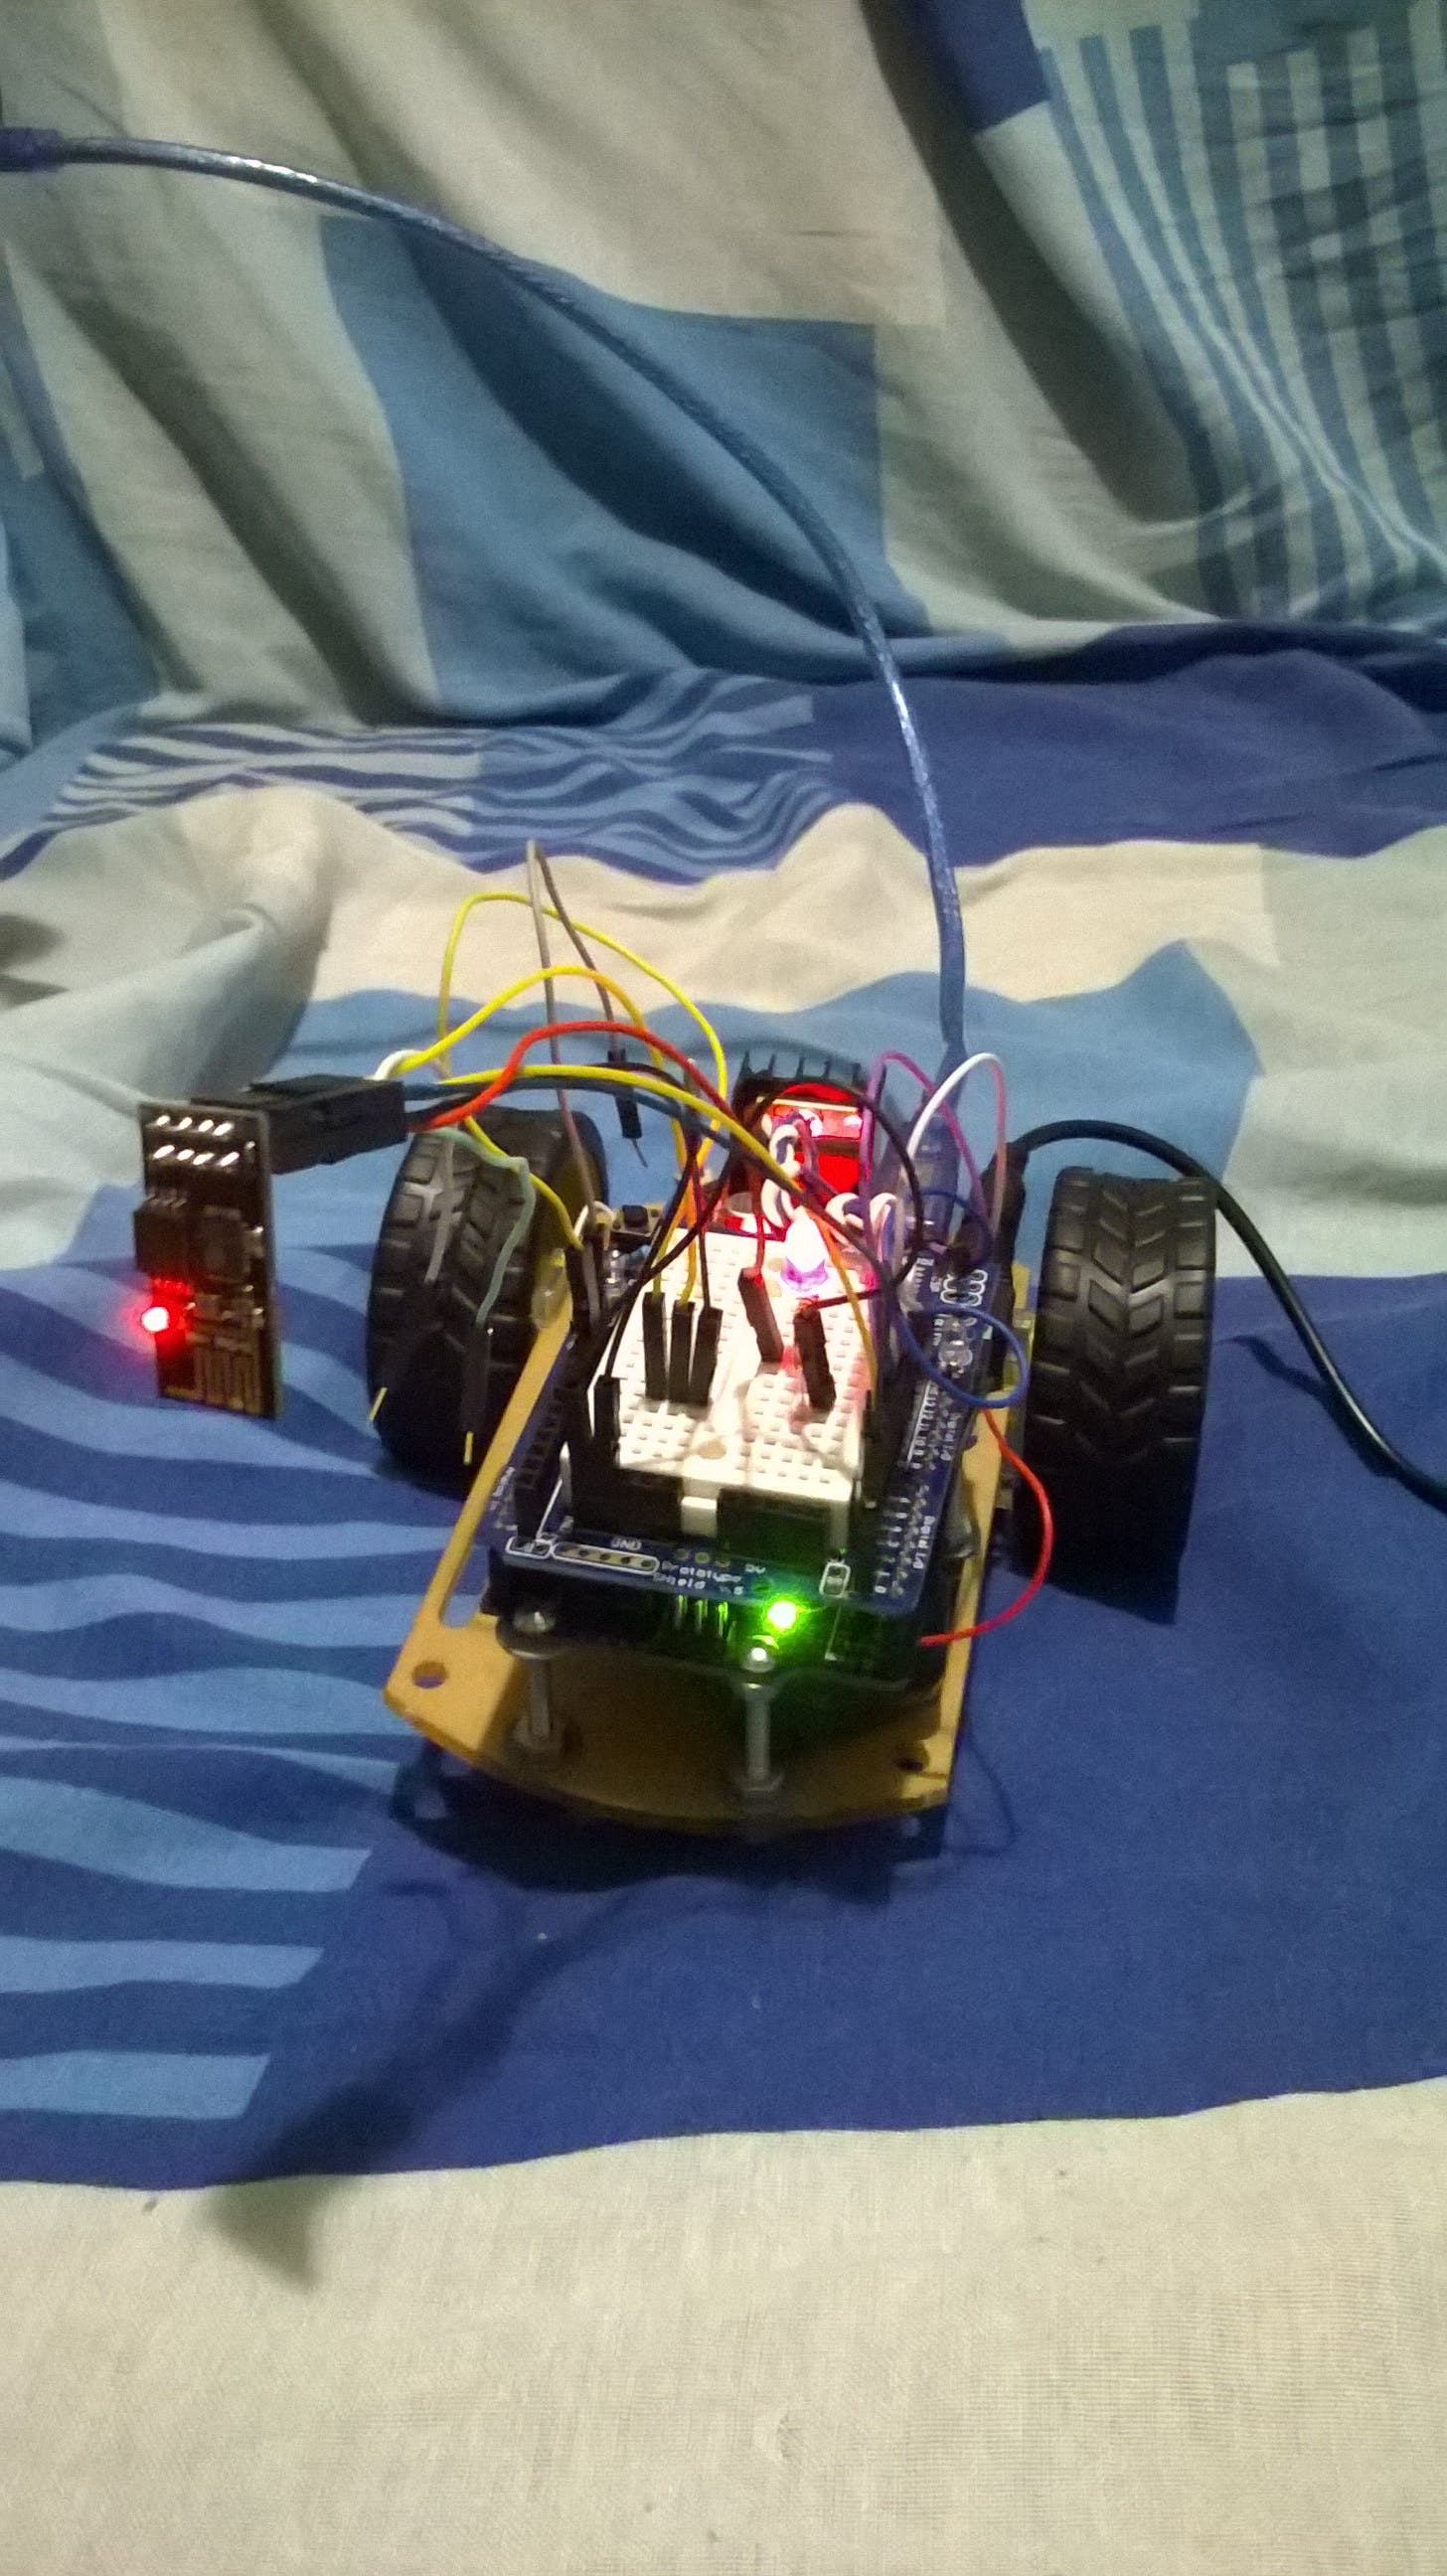 ESP8266 + L298N Motor Drive + Smartphone